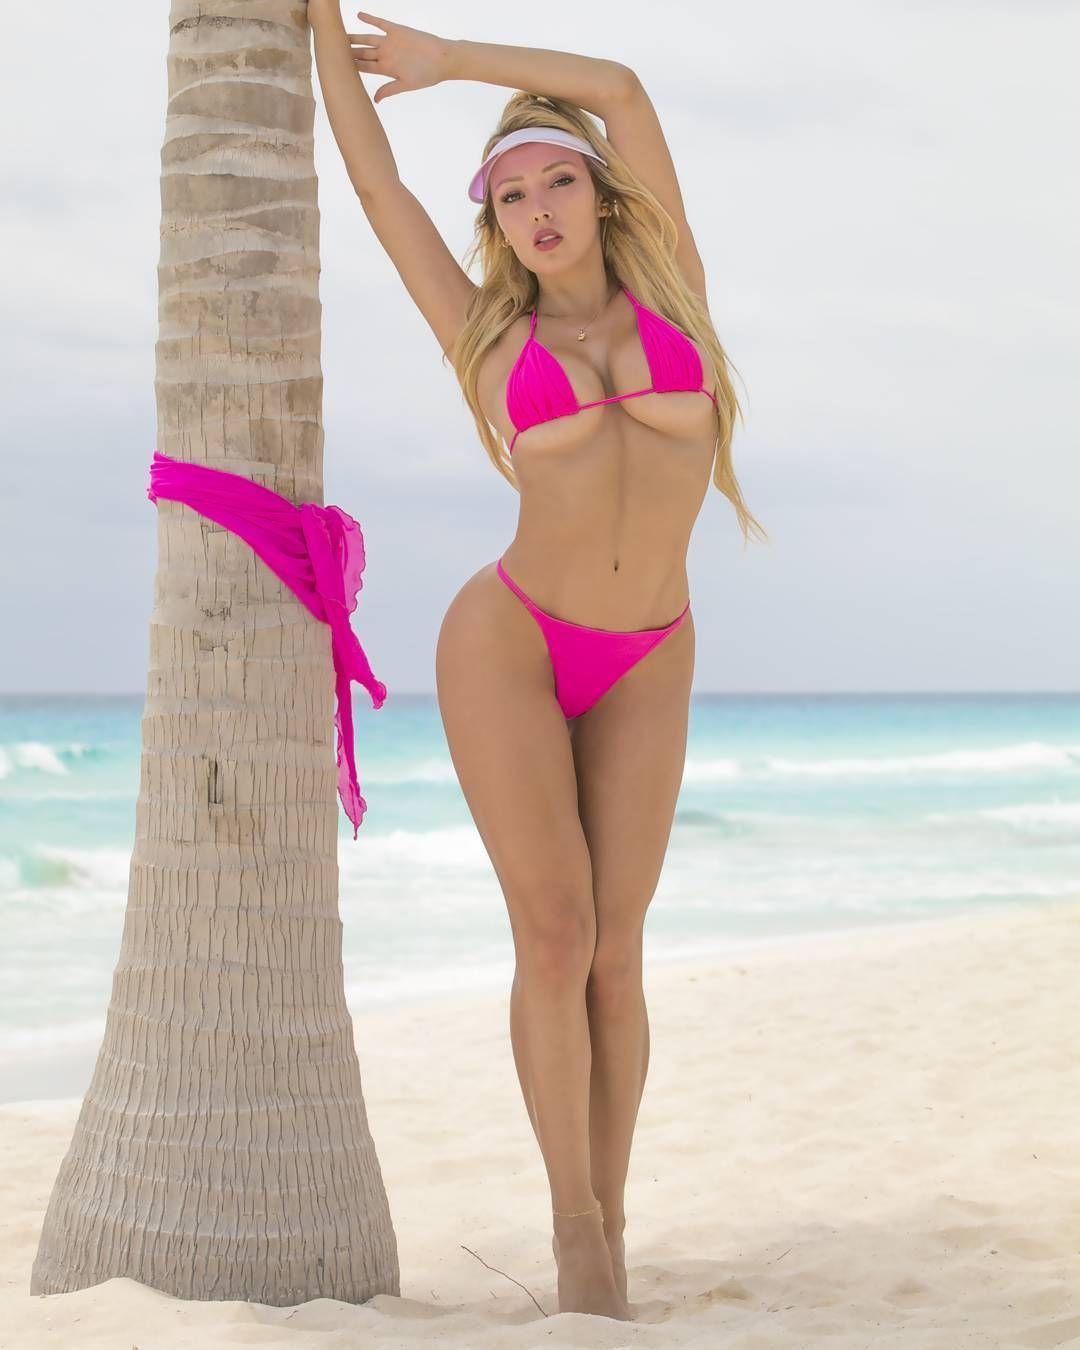 Hot sexy girls photos